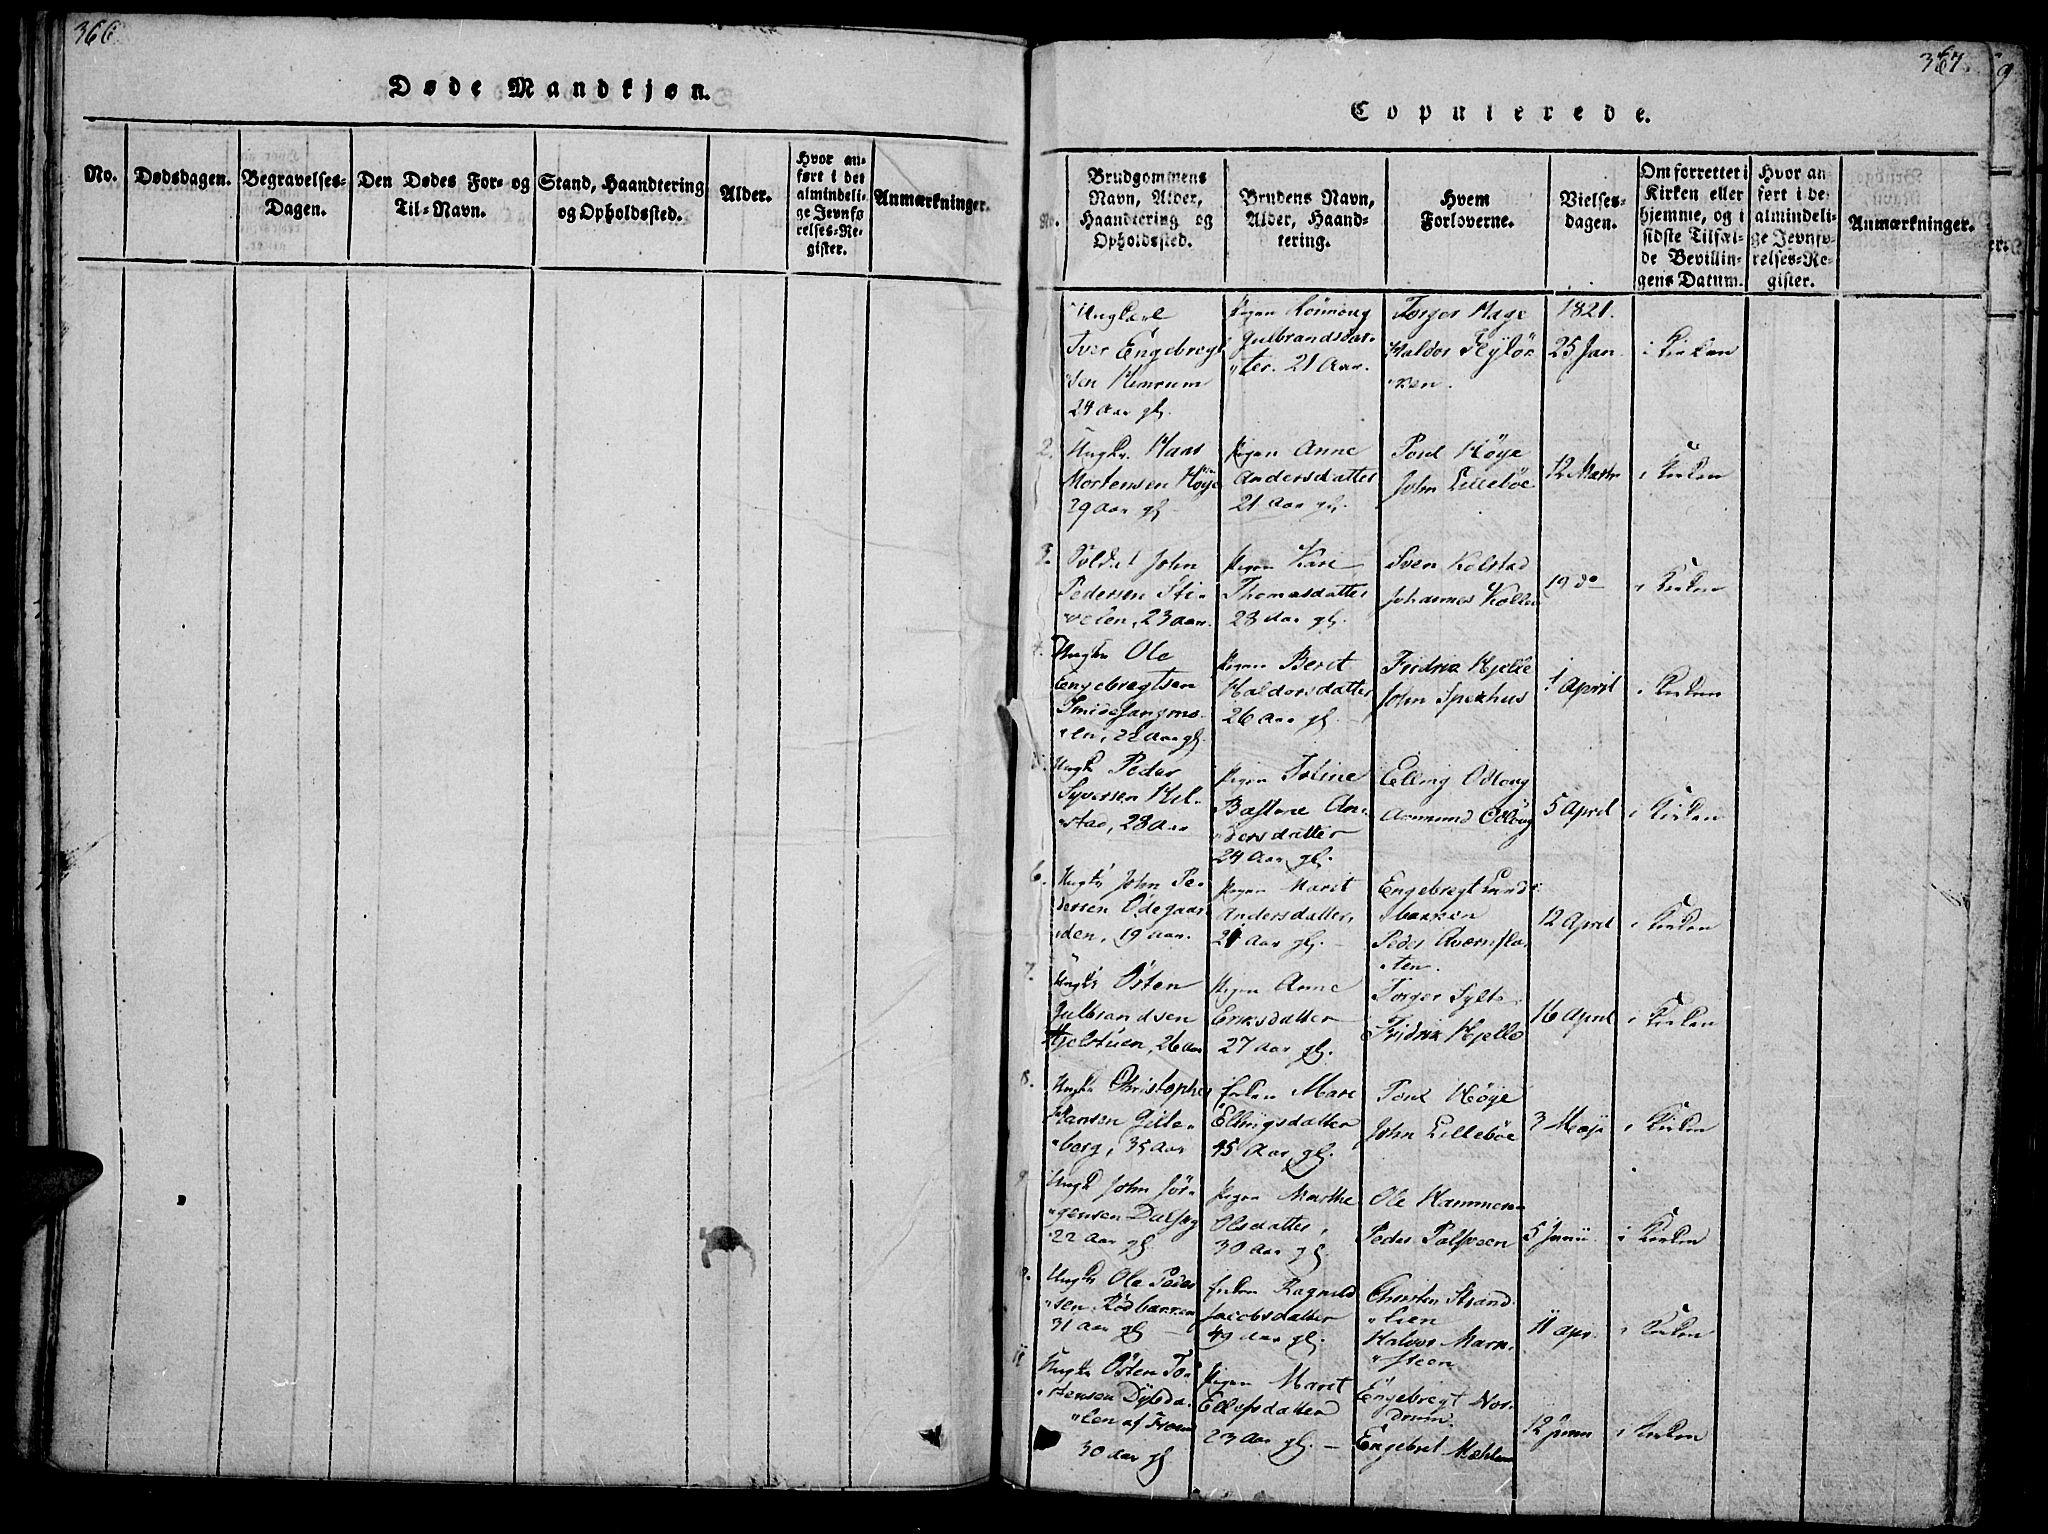 SAH, Ringebu prestekontor, Ministerialbok nr. 4, 1821-1839, s. 366-367